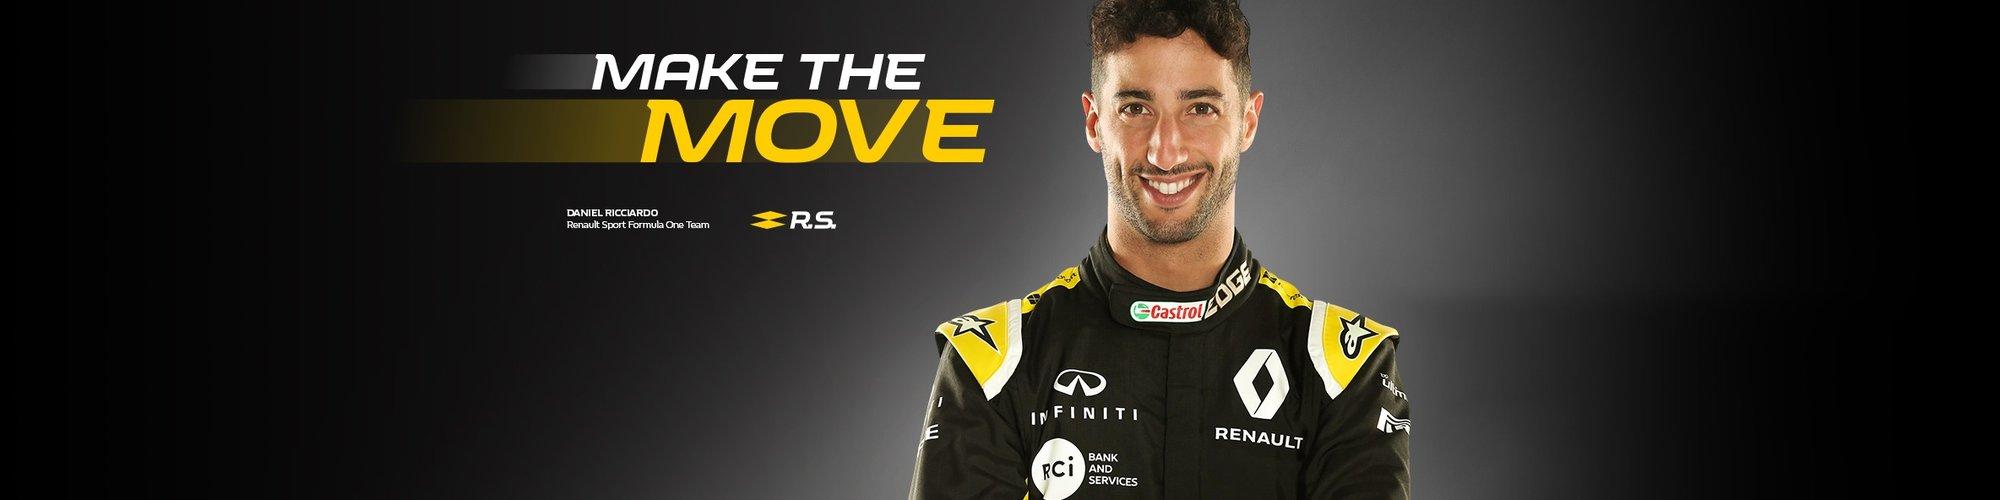 Daniel Ricciardo for Renault in Formula 1